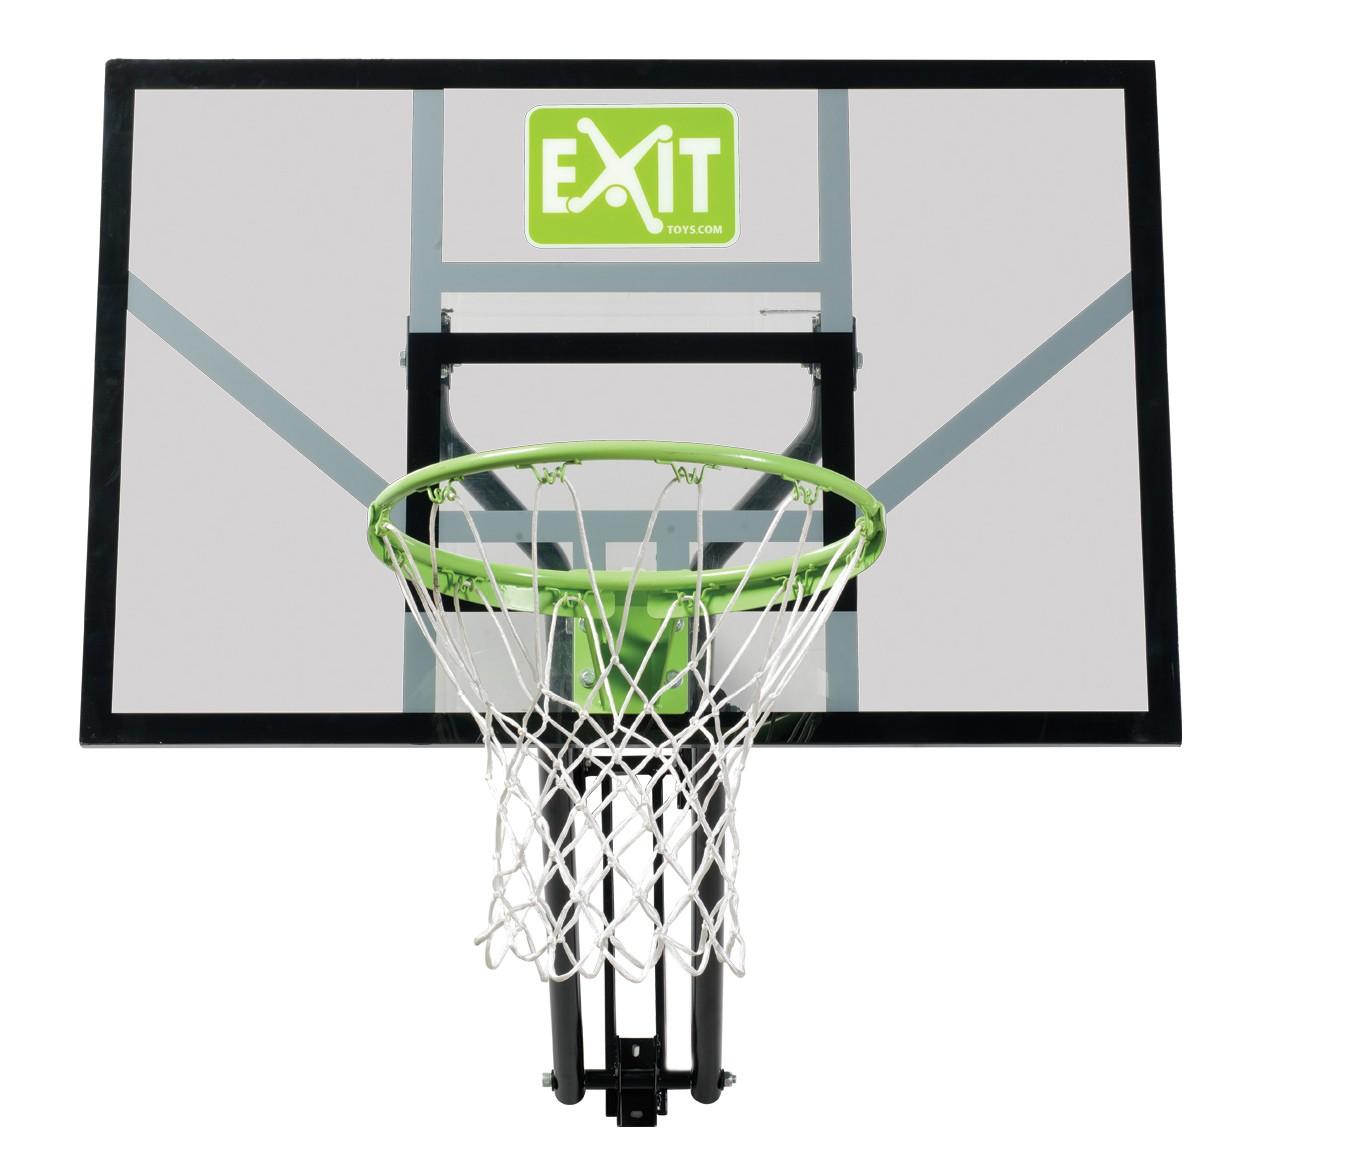 Basketballkorb dunking mit Brett EXIT Galaxy Wall-mount 116x77cm Bild 1